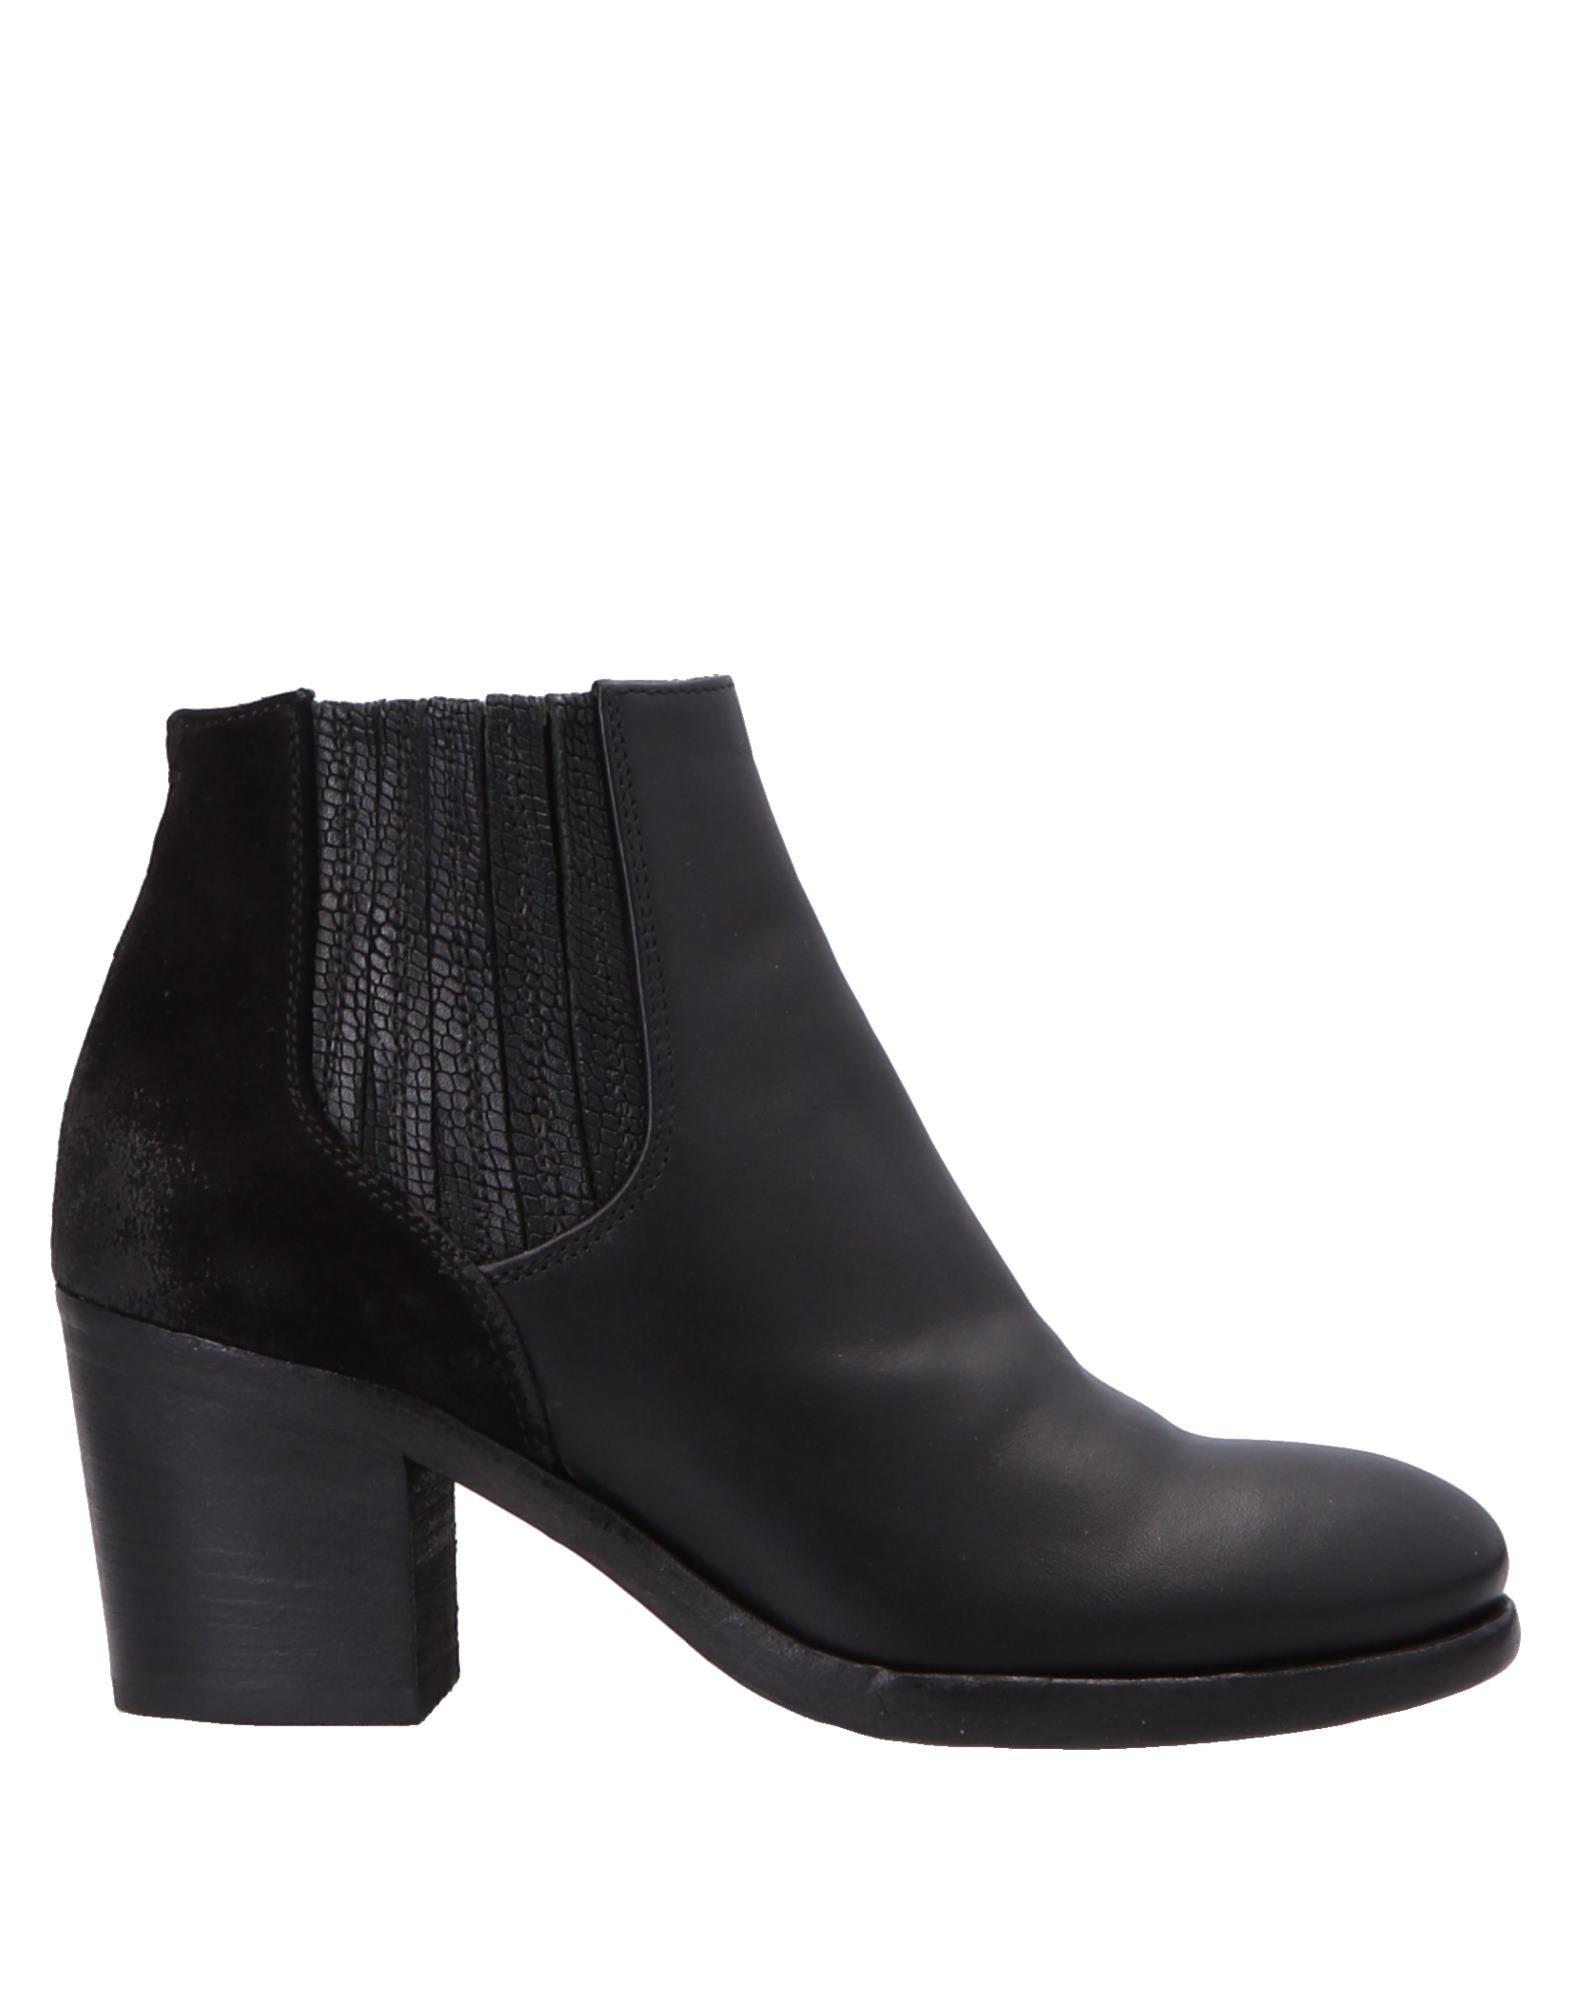 Pantanetti Chelsea Boots Damen  11549245XJGut aussehende strapazierfähige Schuhe